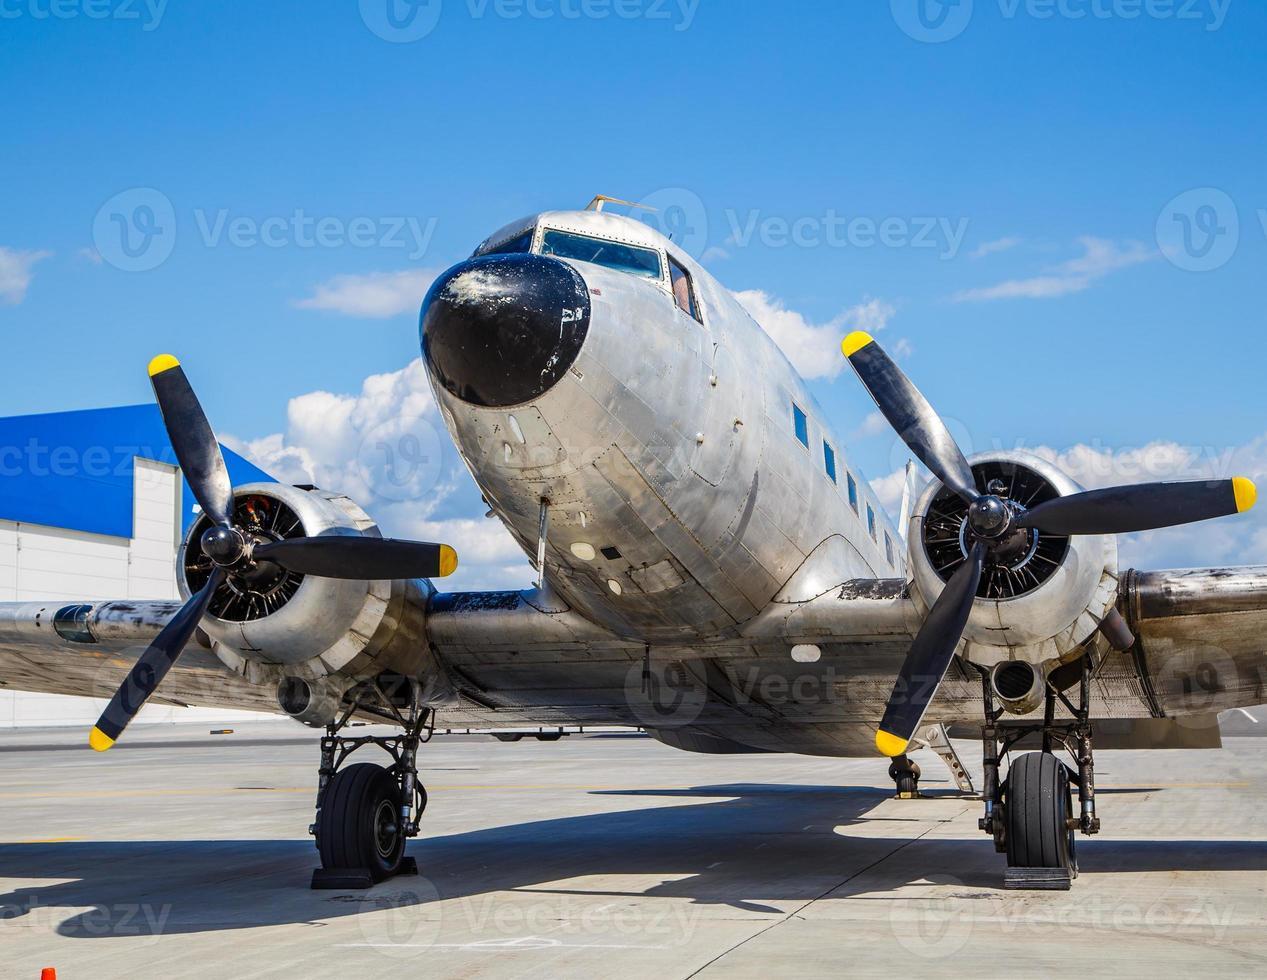 altes Flugzeug Douglas 40s am Flughafen foto